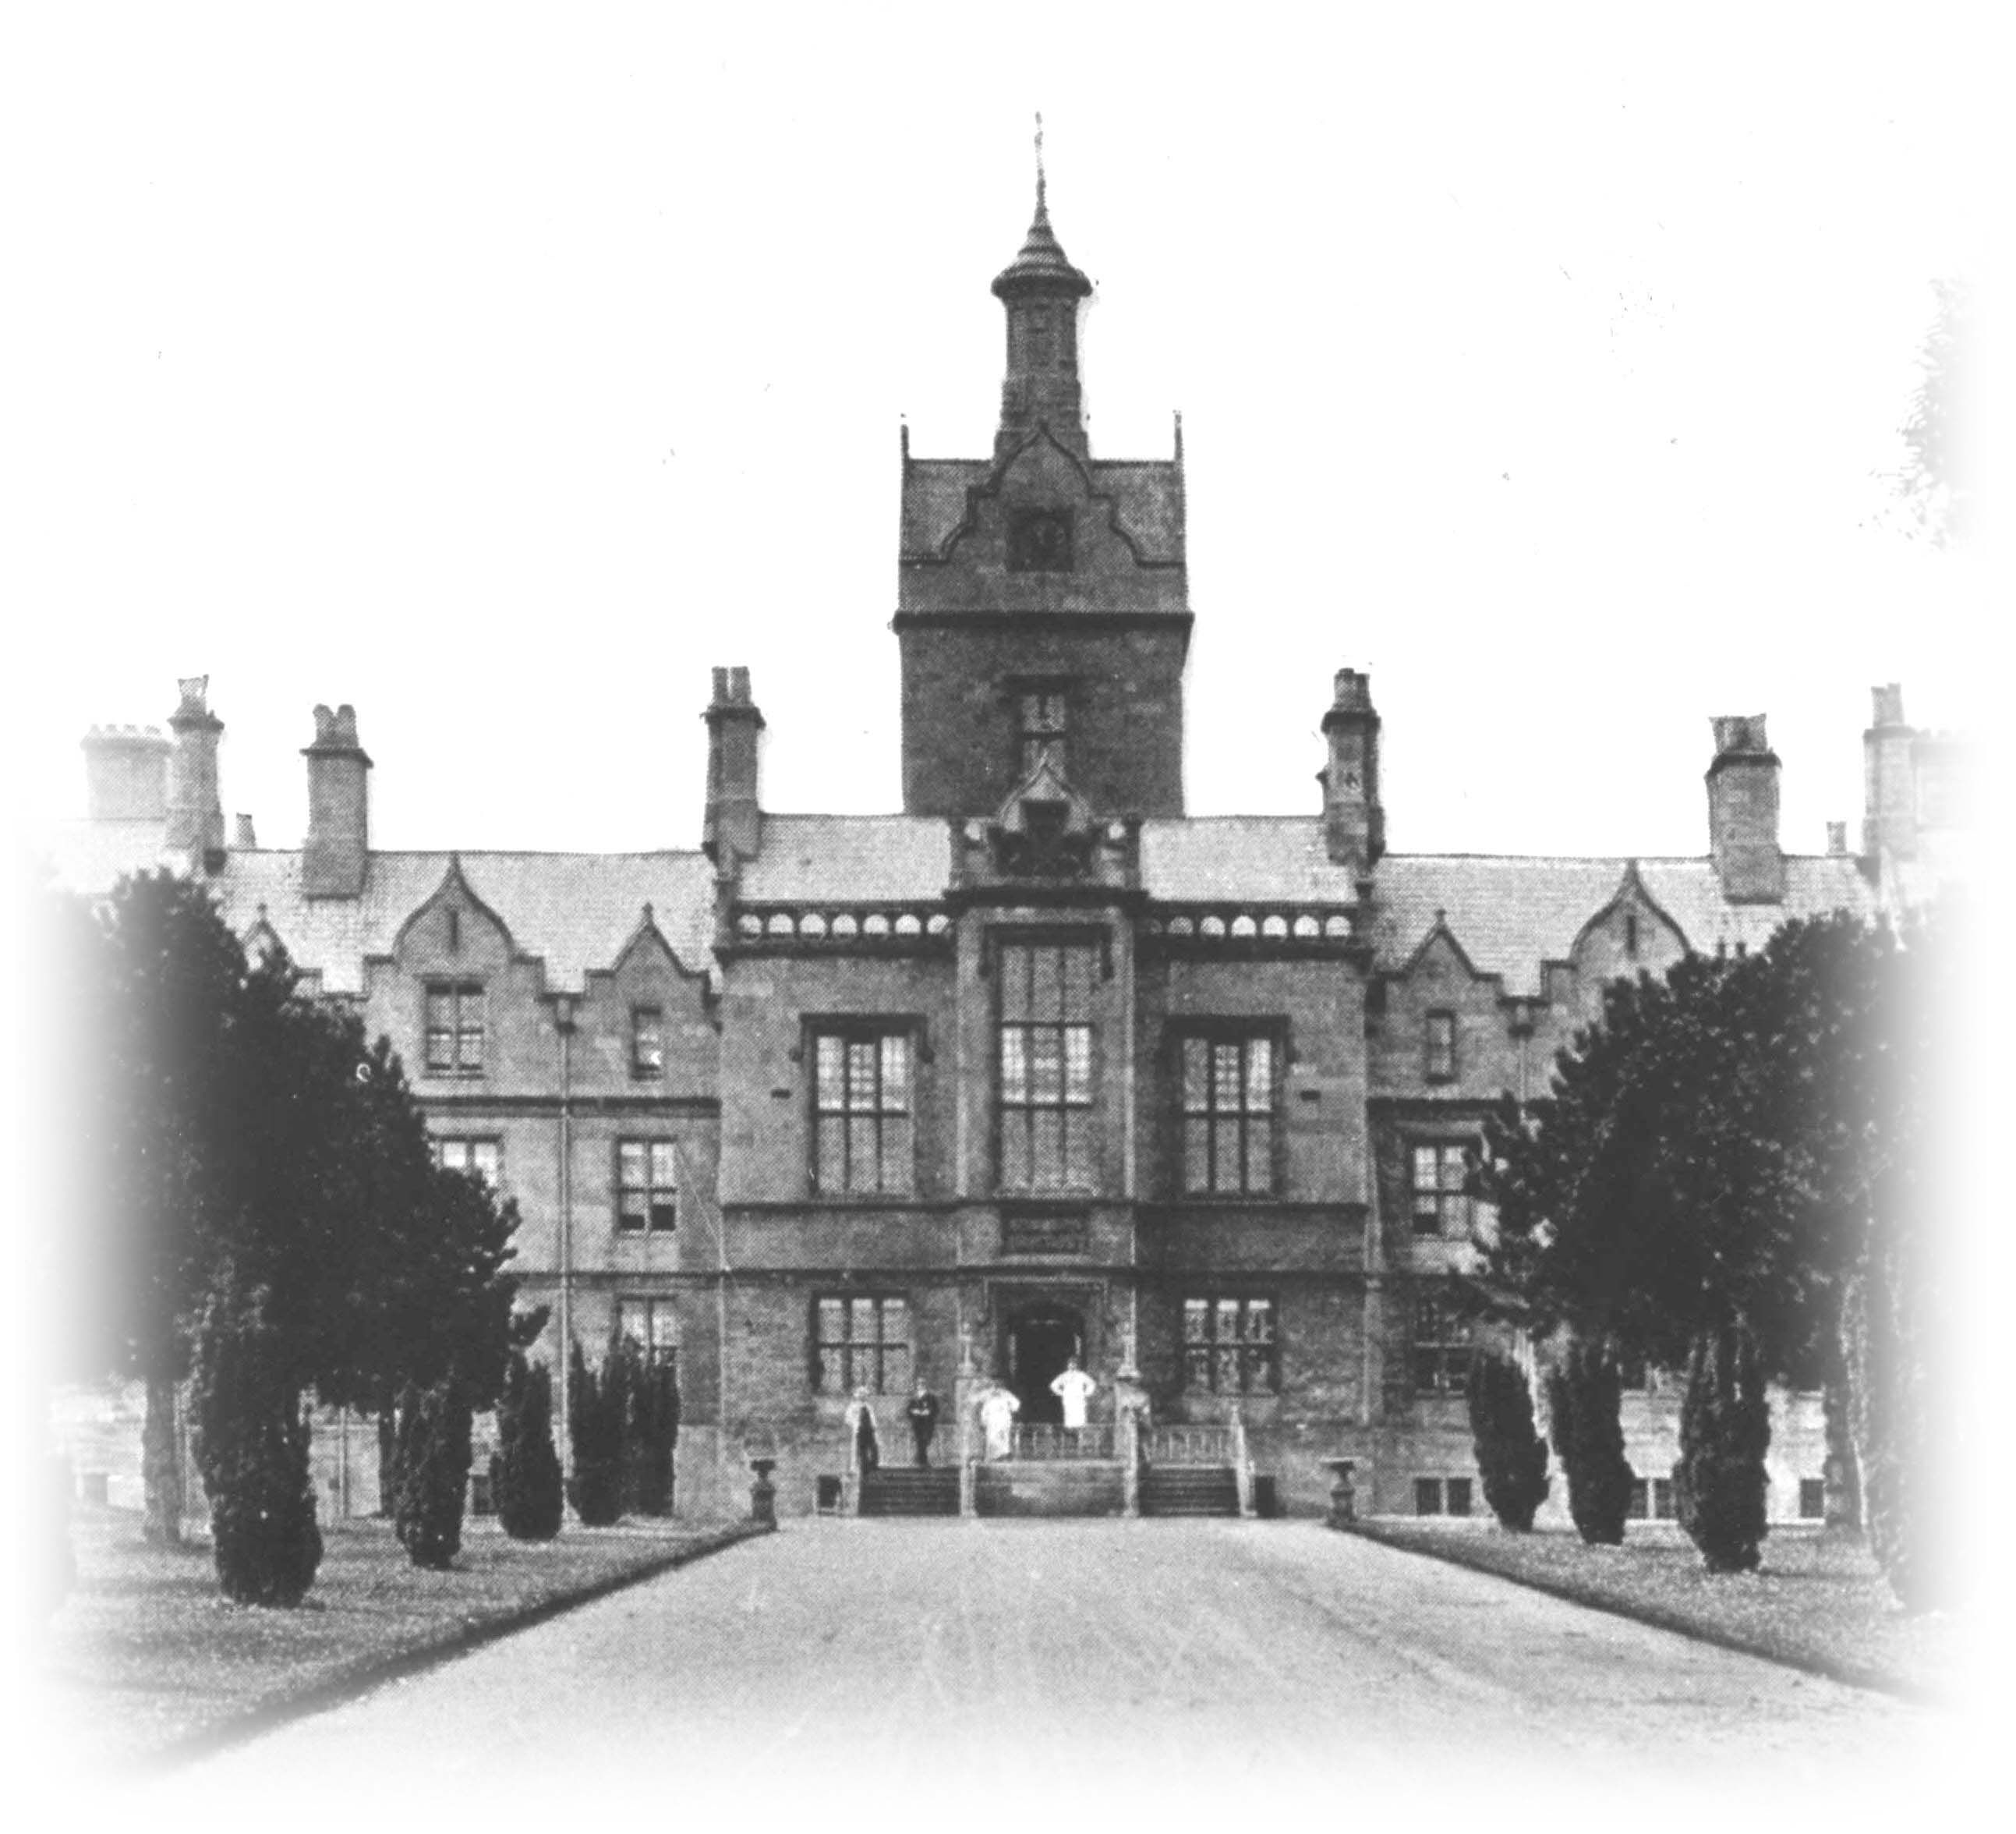 North Wales Hospital Denbigh Abandoned Prisons Insane Asylum Abandoned Asylums